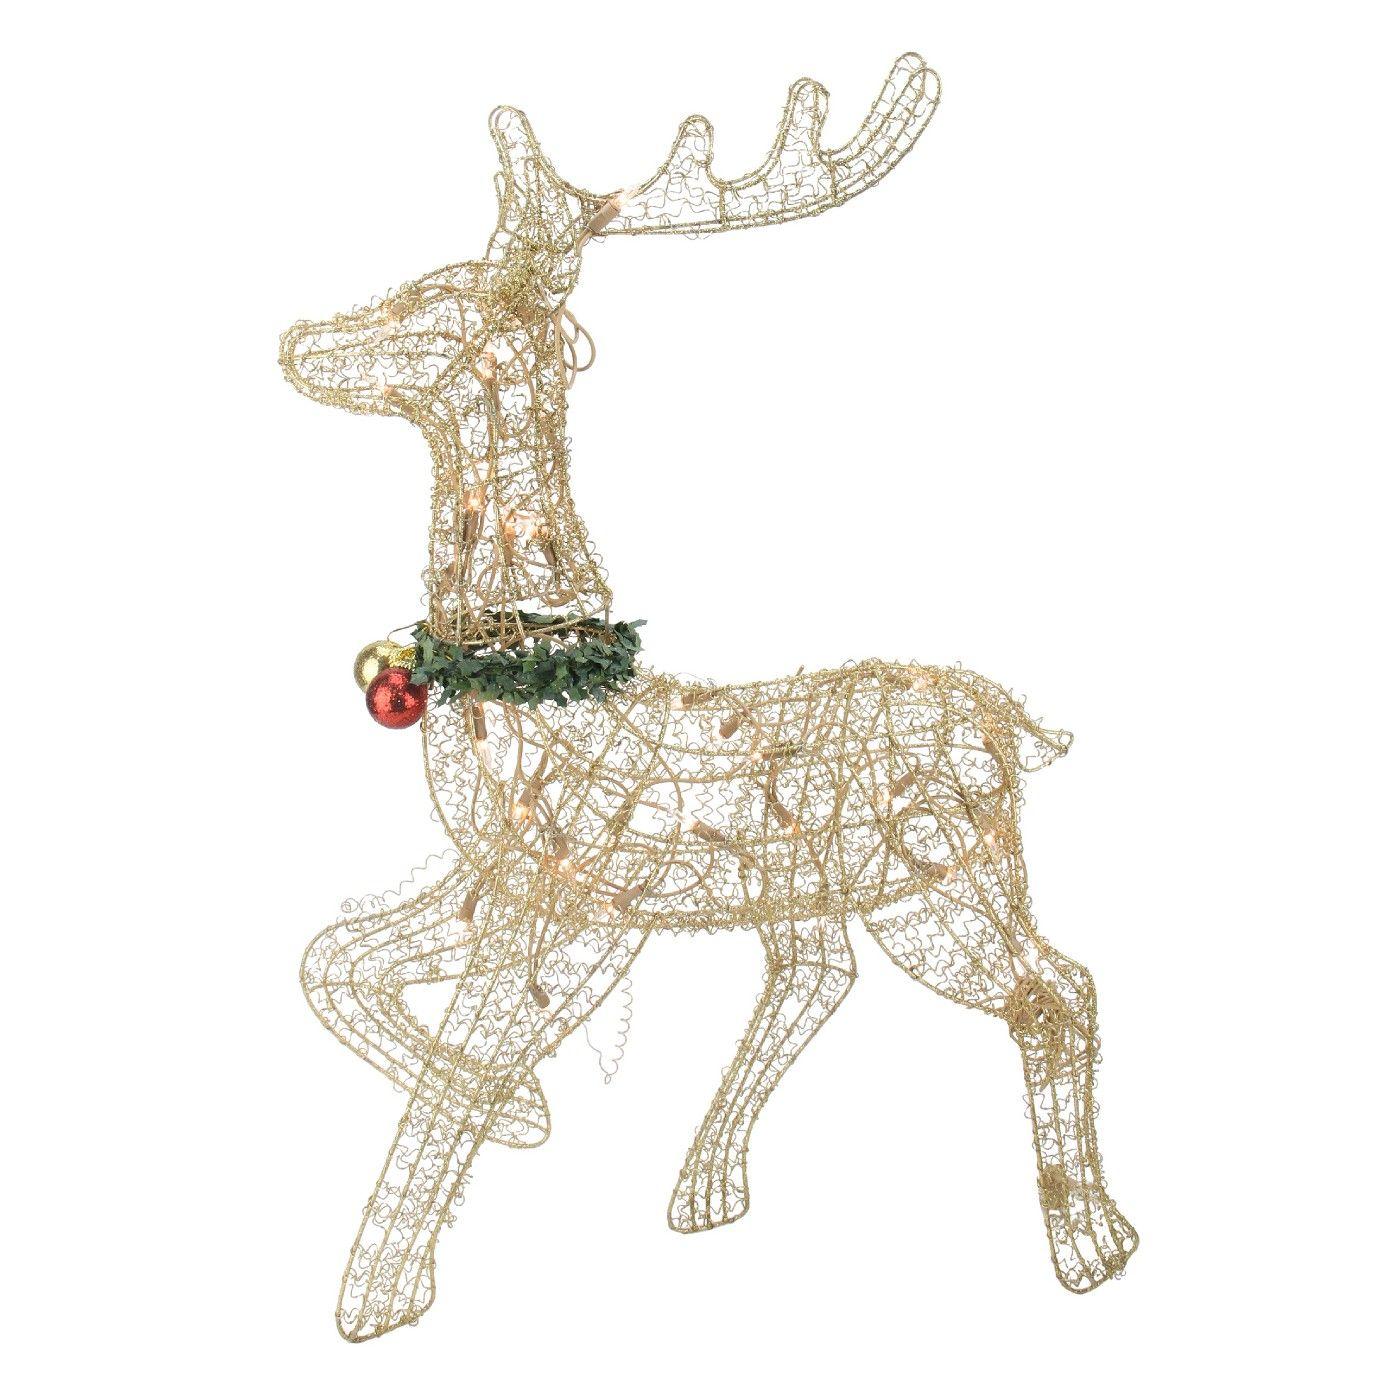 Northlight 25 Gold Lighted Prancing Reindeer Outdoor Christmas Decor Outdoor Christmas Decorations Outdoor Christmas Reindeer Lights